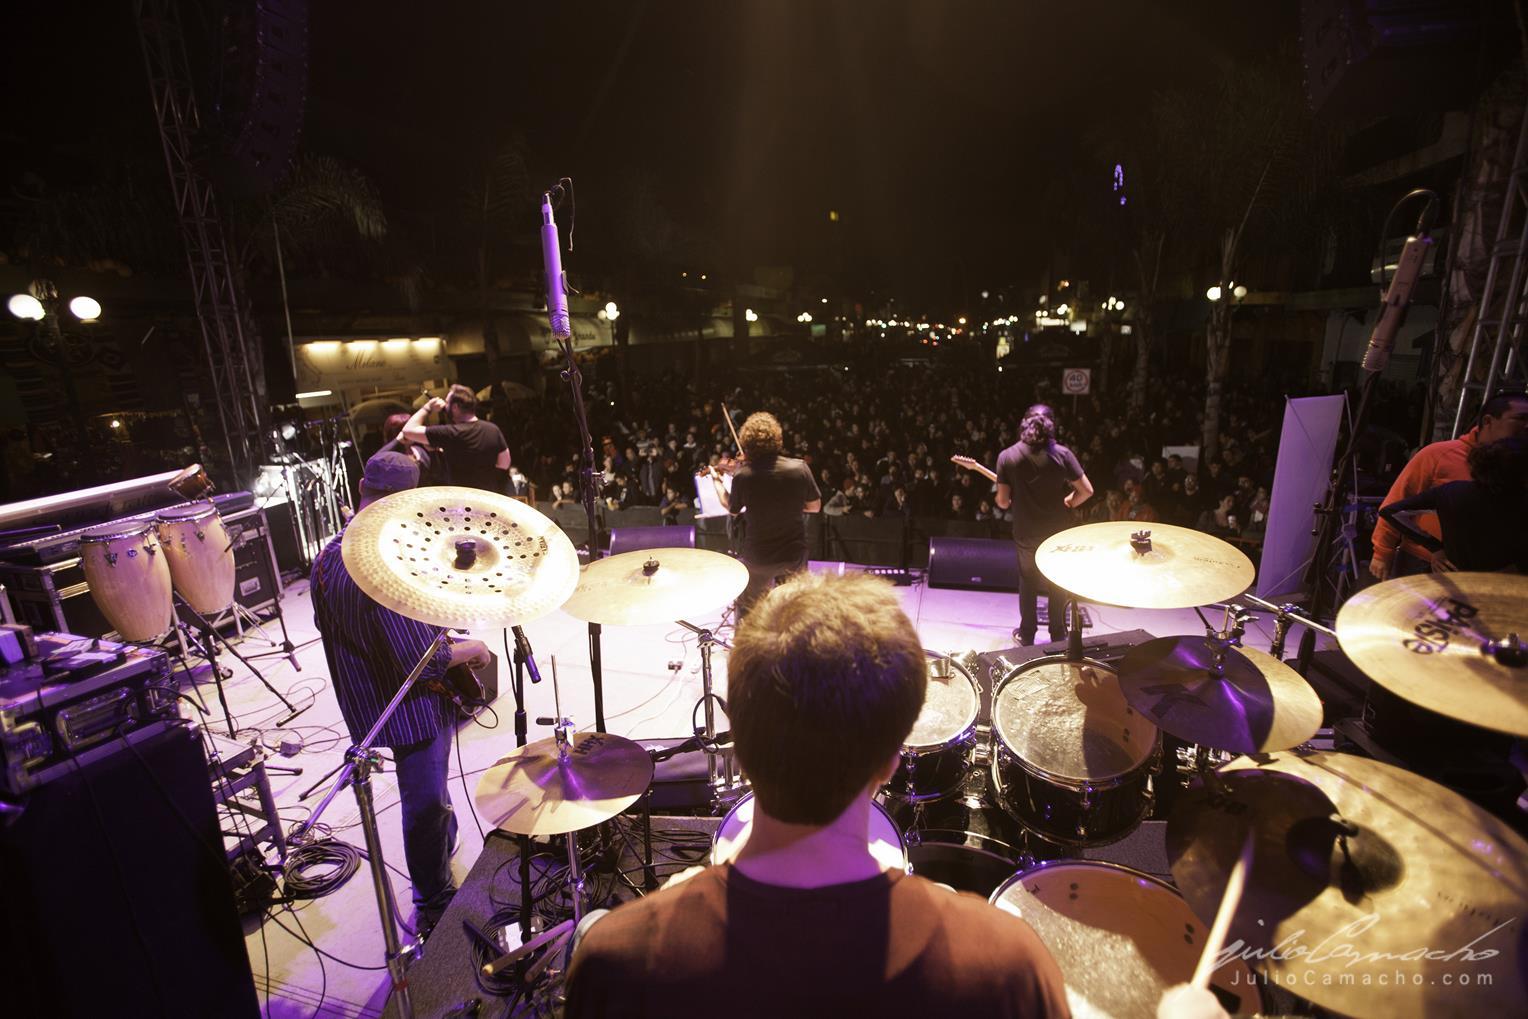 2014-10-30 31 CAST TOUR Ensenada y Tijuana - 1751 - www.Juli (Copy).jpg